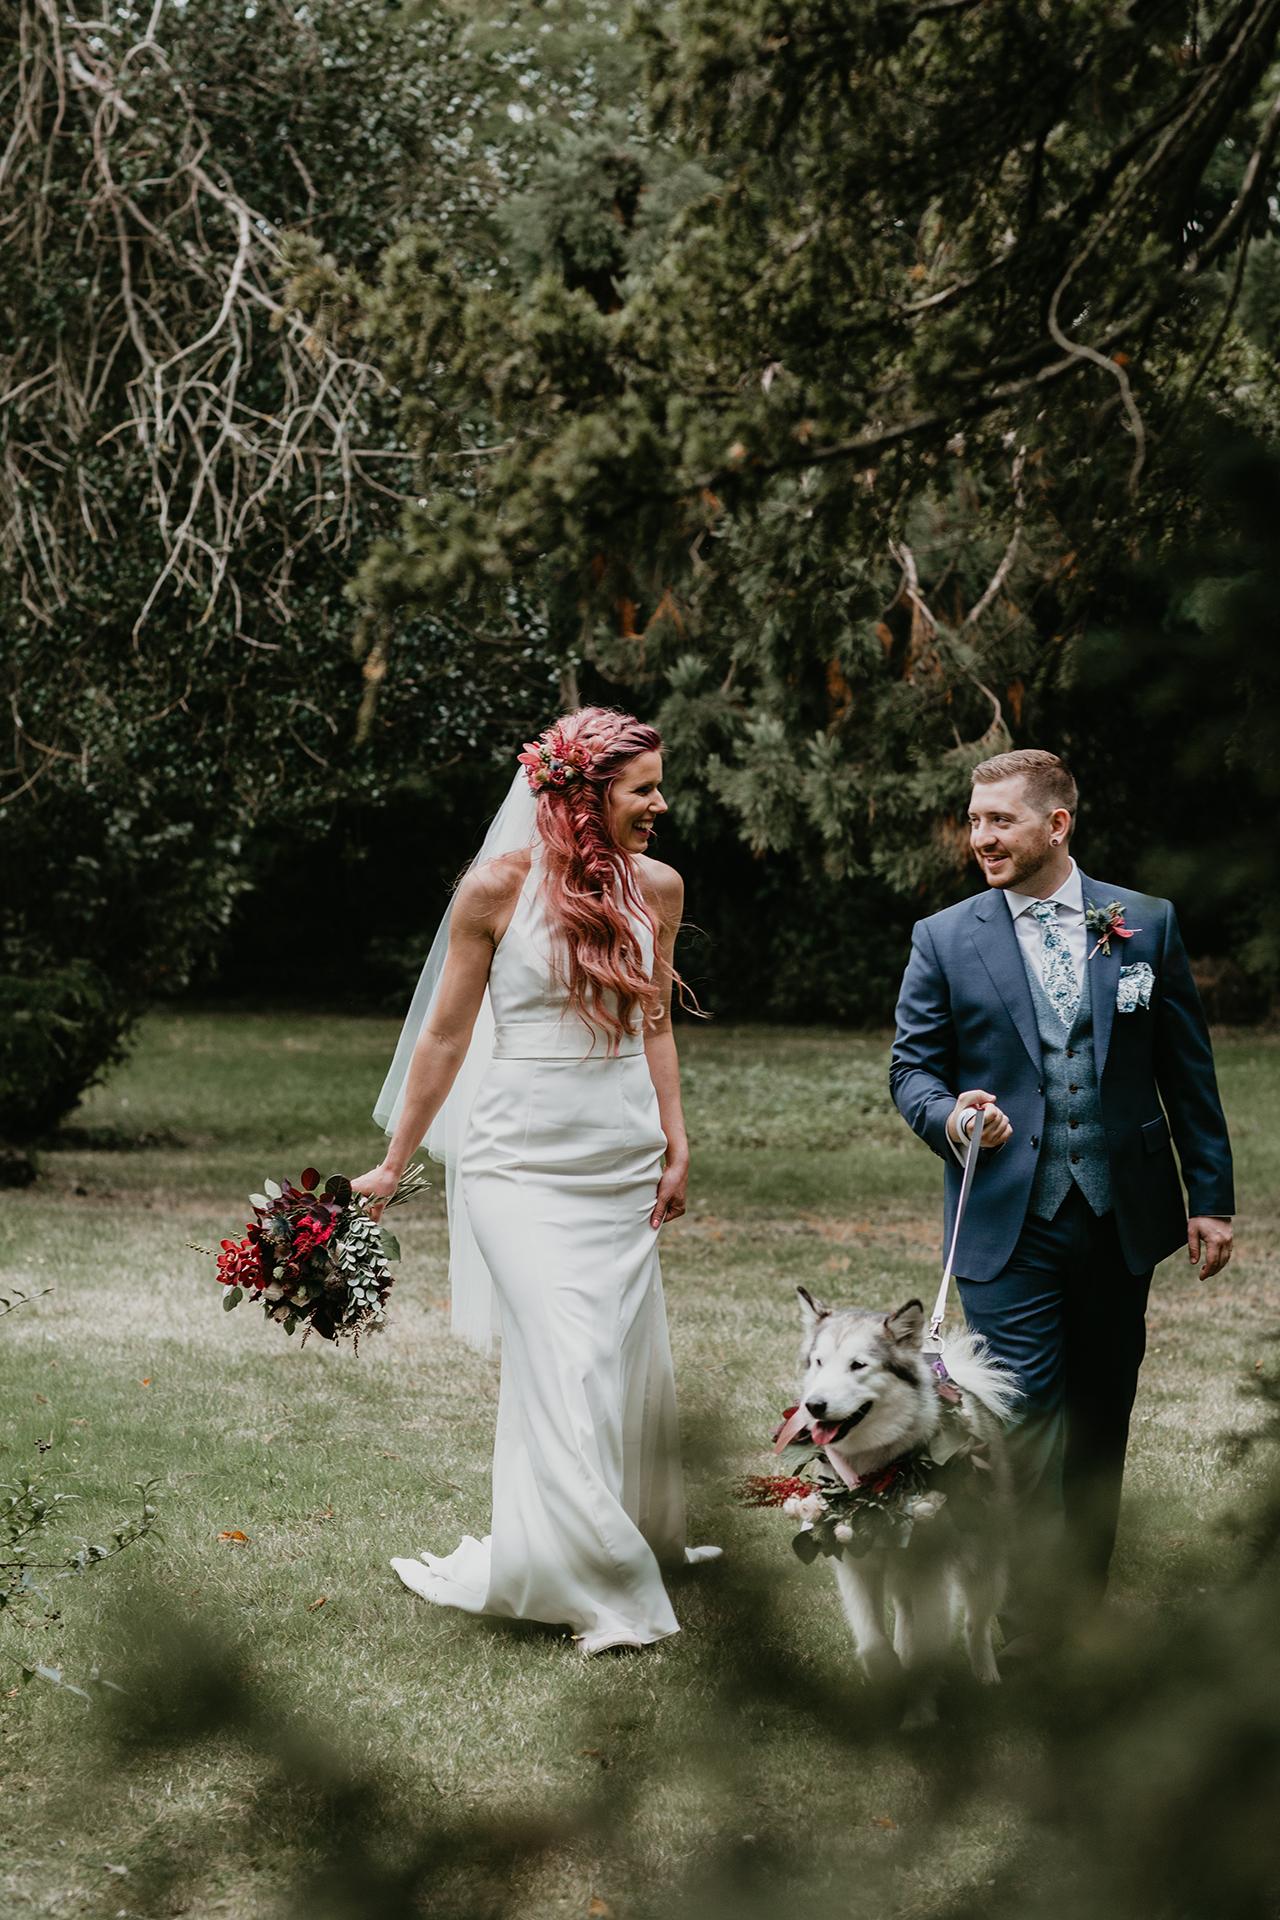 Fun Autumnal Wedding- Nicki Shea Photography-Autumn Wedding- Alternative Bride- Unconventional Wedding- Unique Wedding Ideas